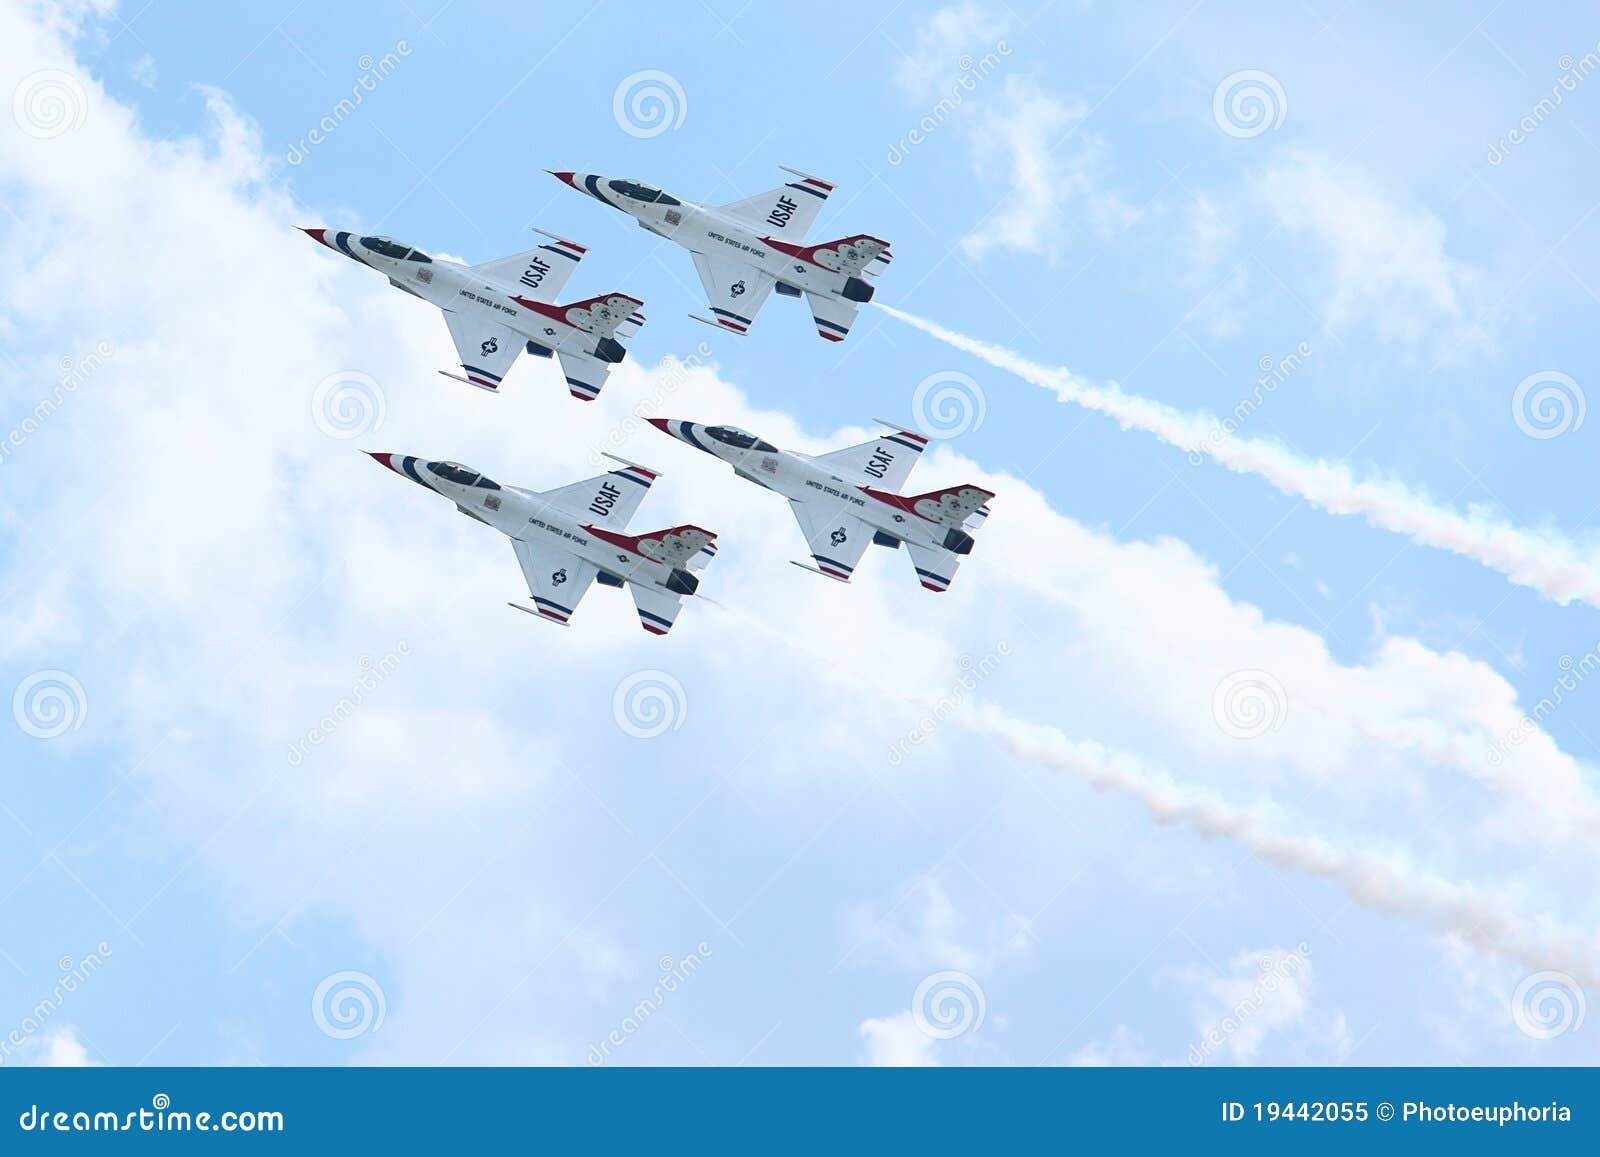 Thunderbirds Air Force Demonstration Team